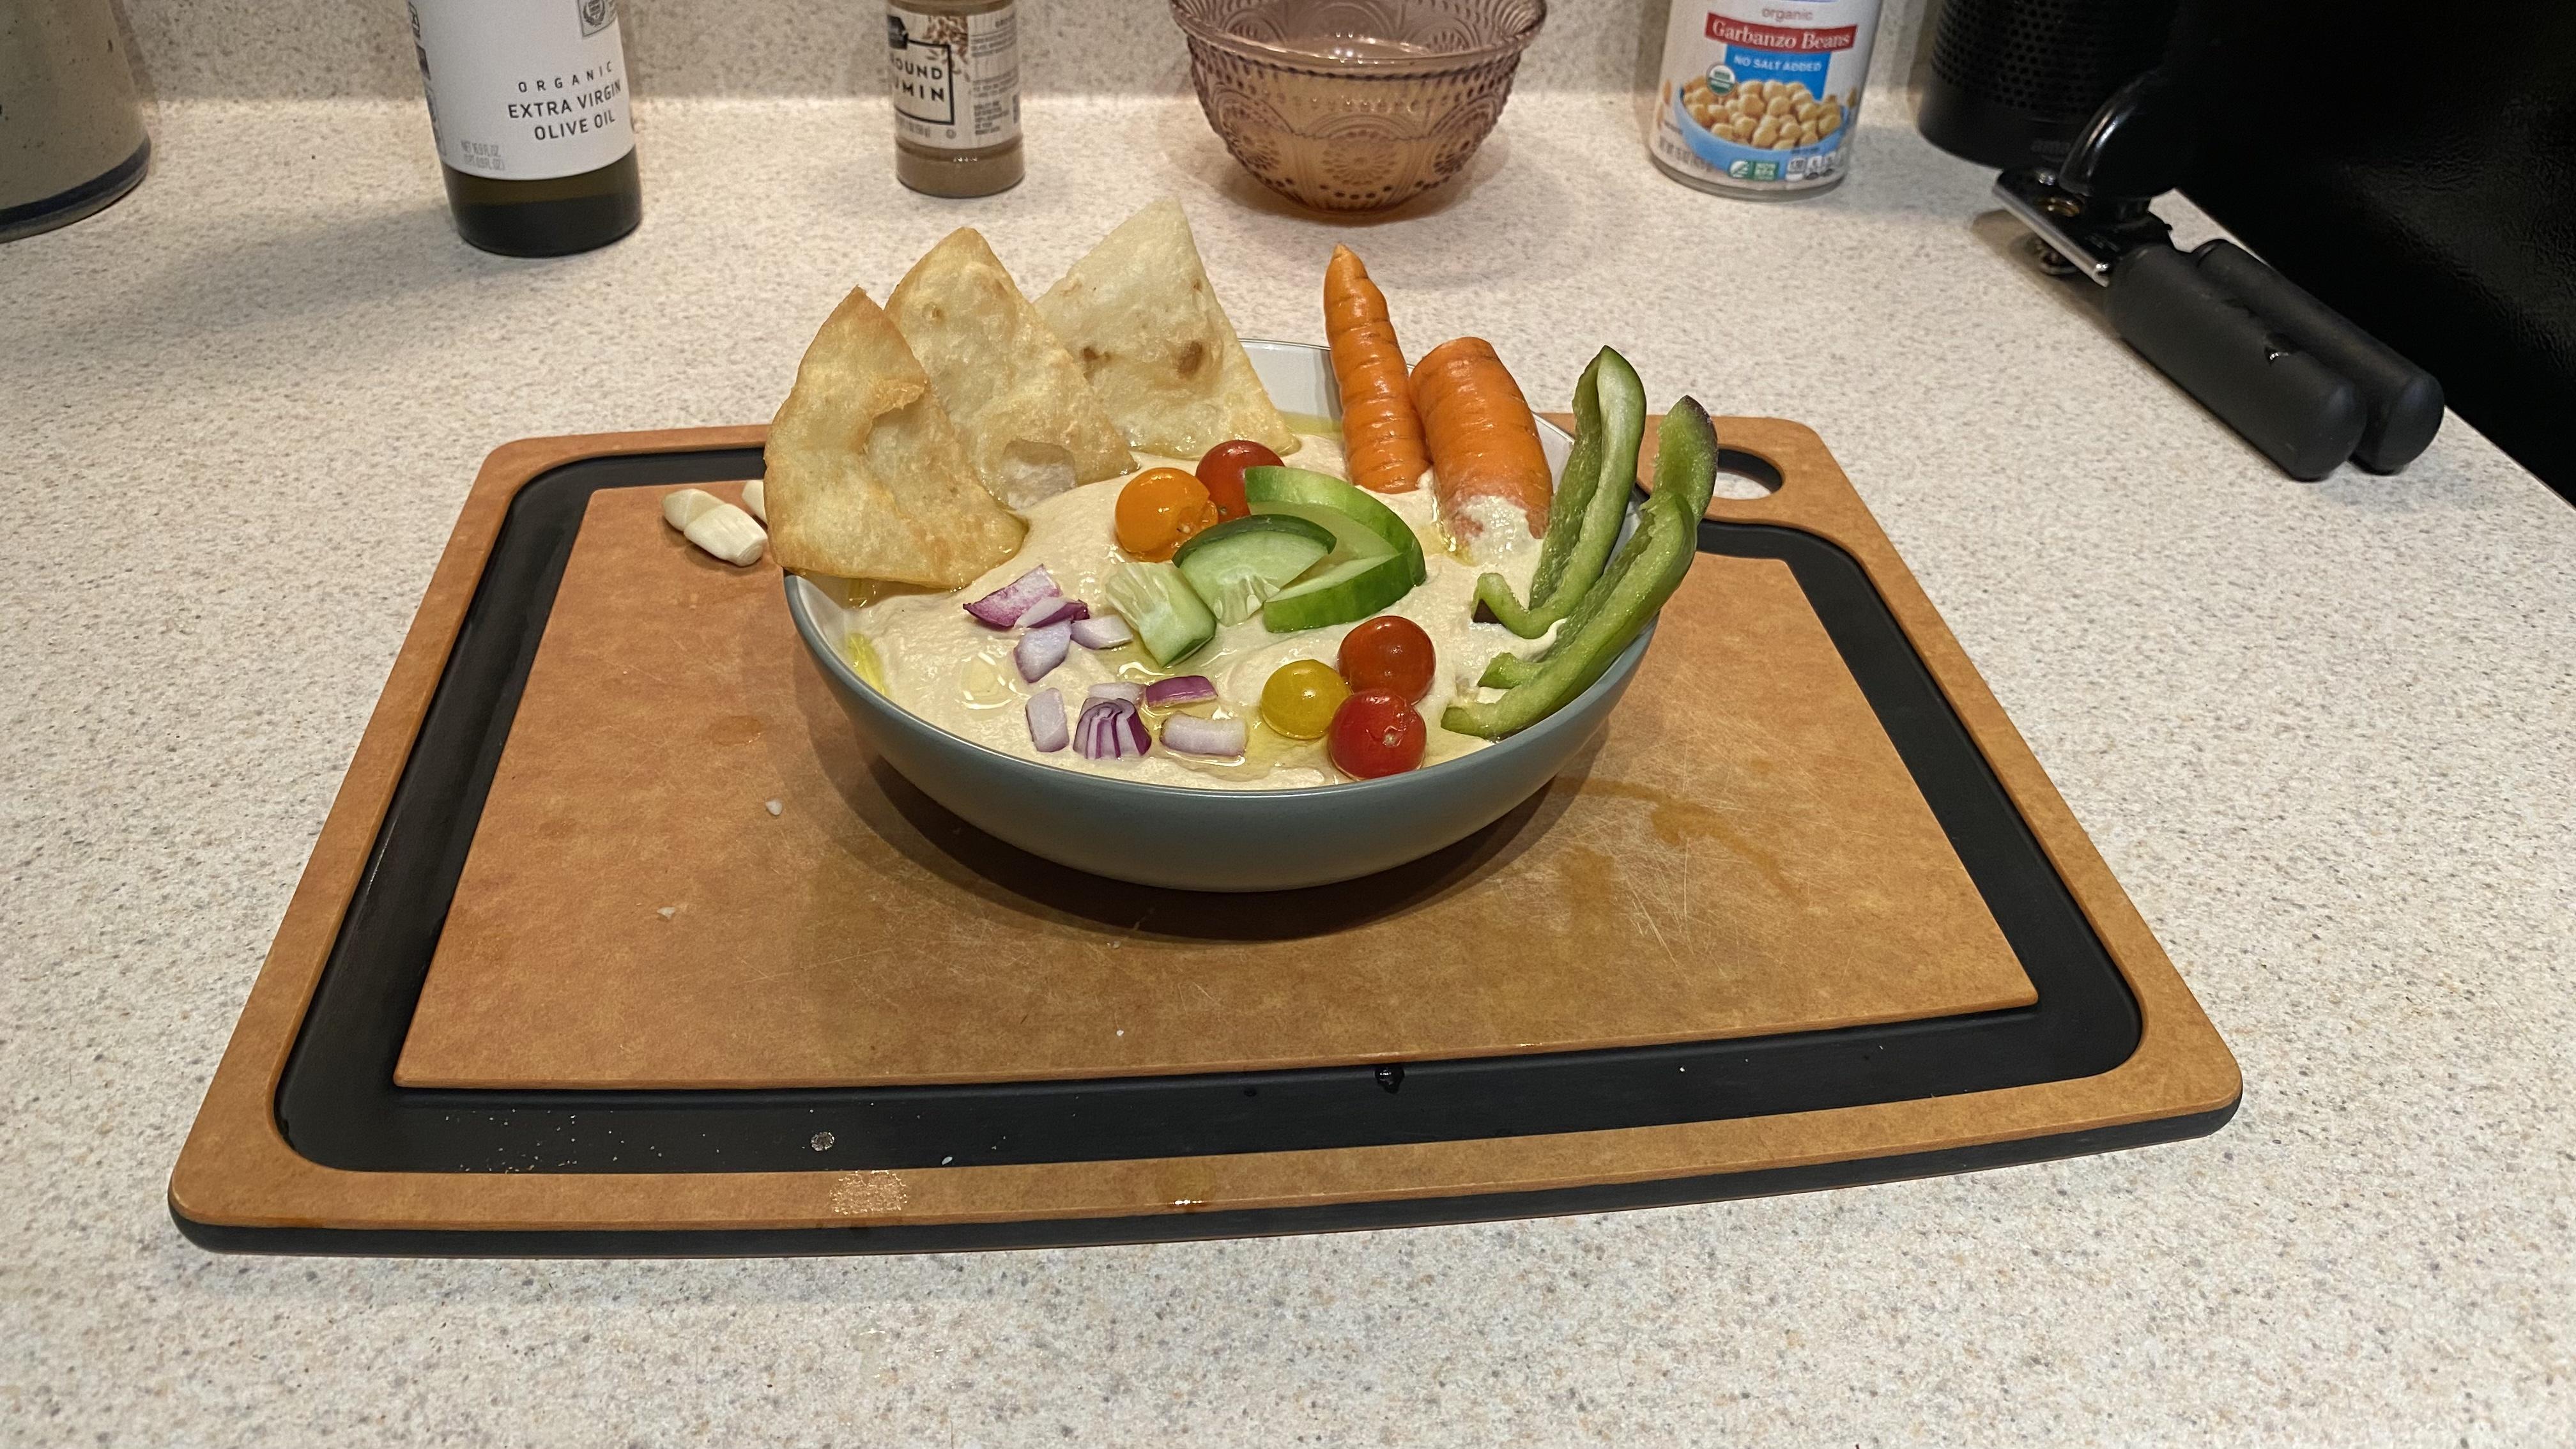 A bowl of homemade hummus full of freshly-cut veggies!